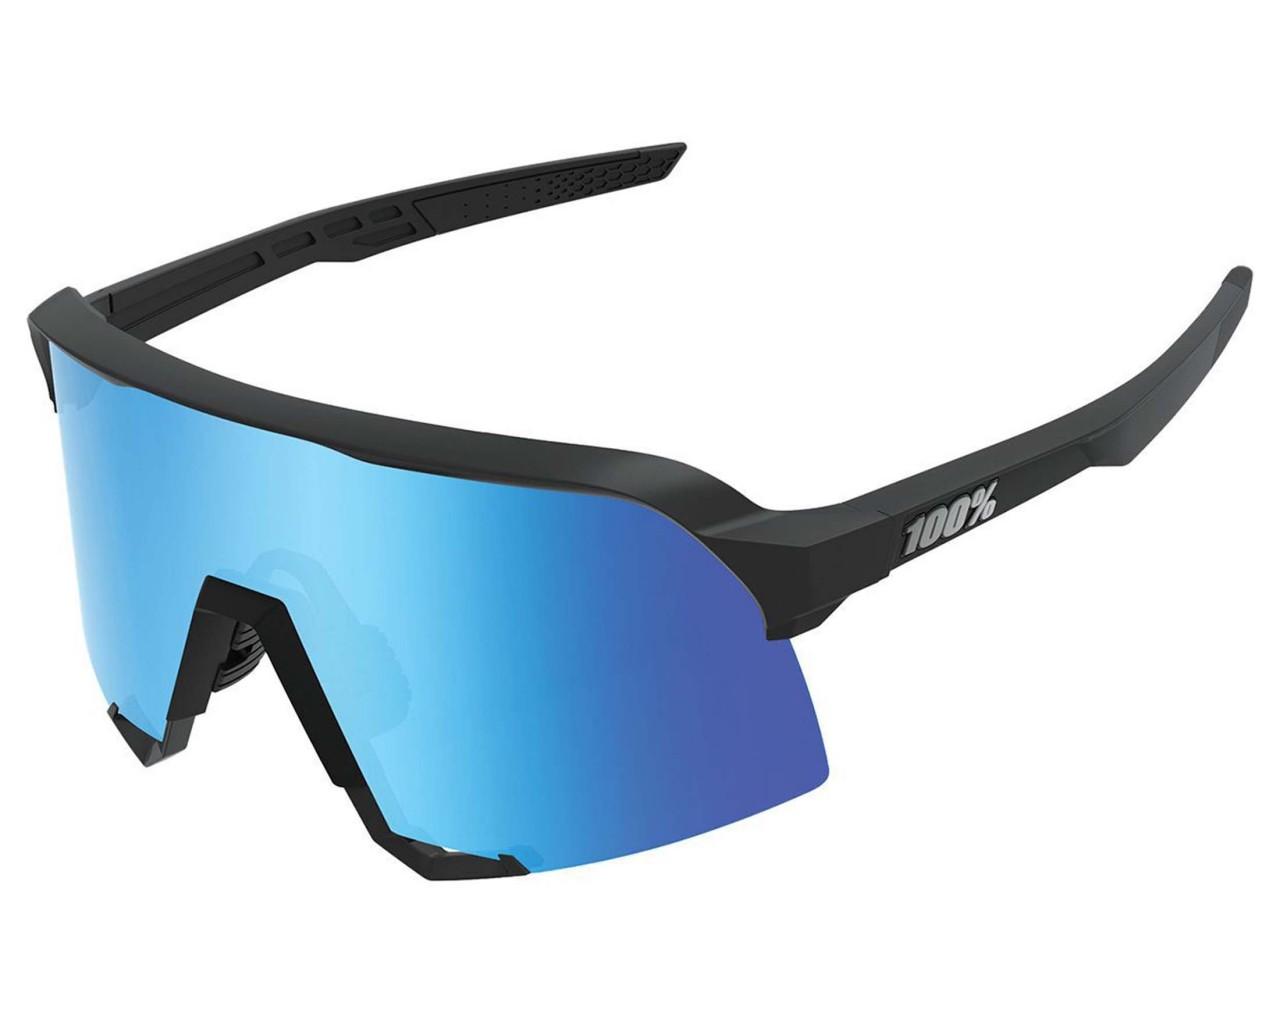 100% S3 - Hiper Mirror Lens Sports sunglasses | matte black